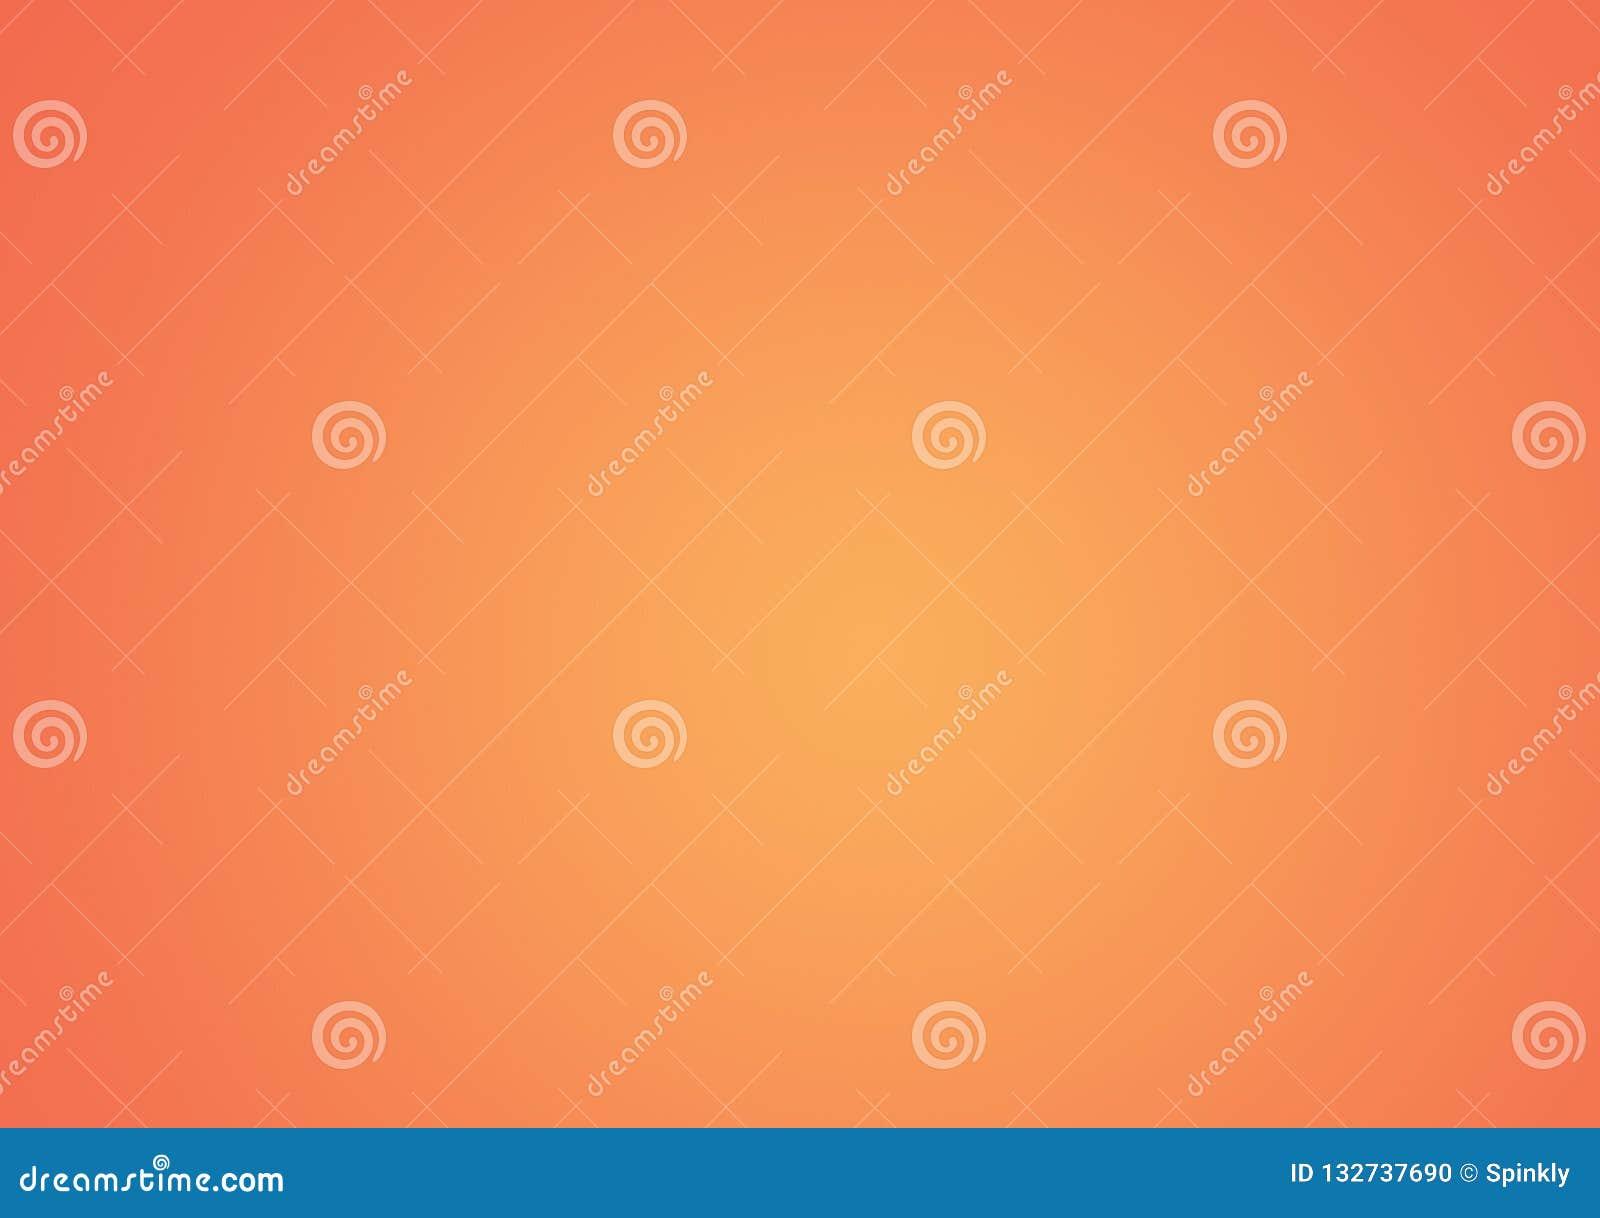 peach color gradient wallpaper design background stock illustration illustration of artistic backdrop 132737690 https www dreamstime com peach color gradient wallpaper design background peach color gradient wallpaper design background use text image image132737690